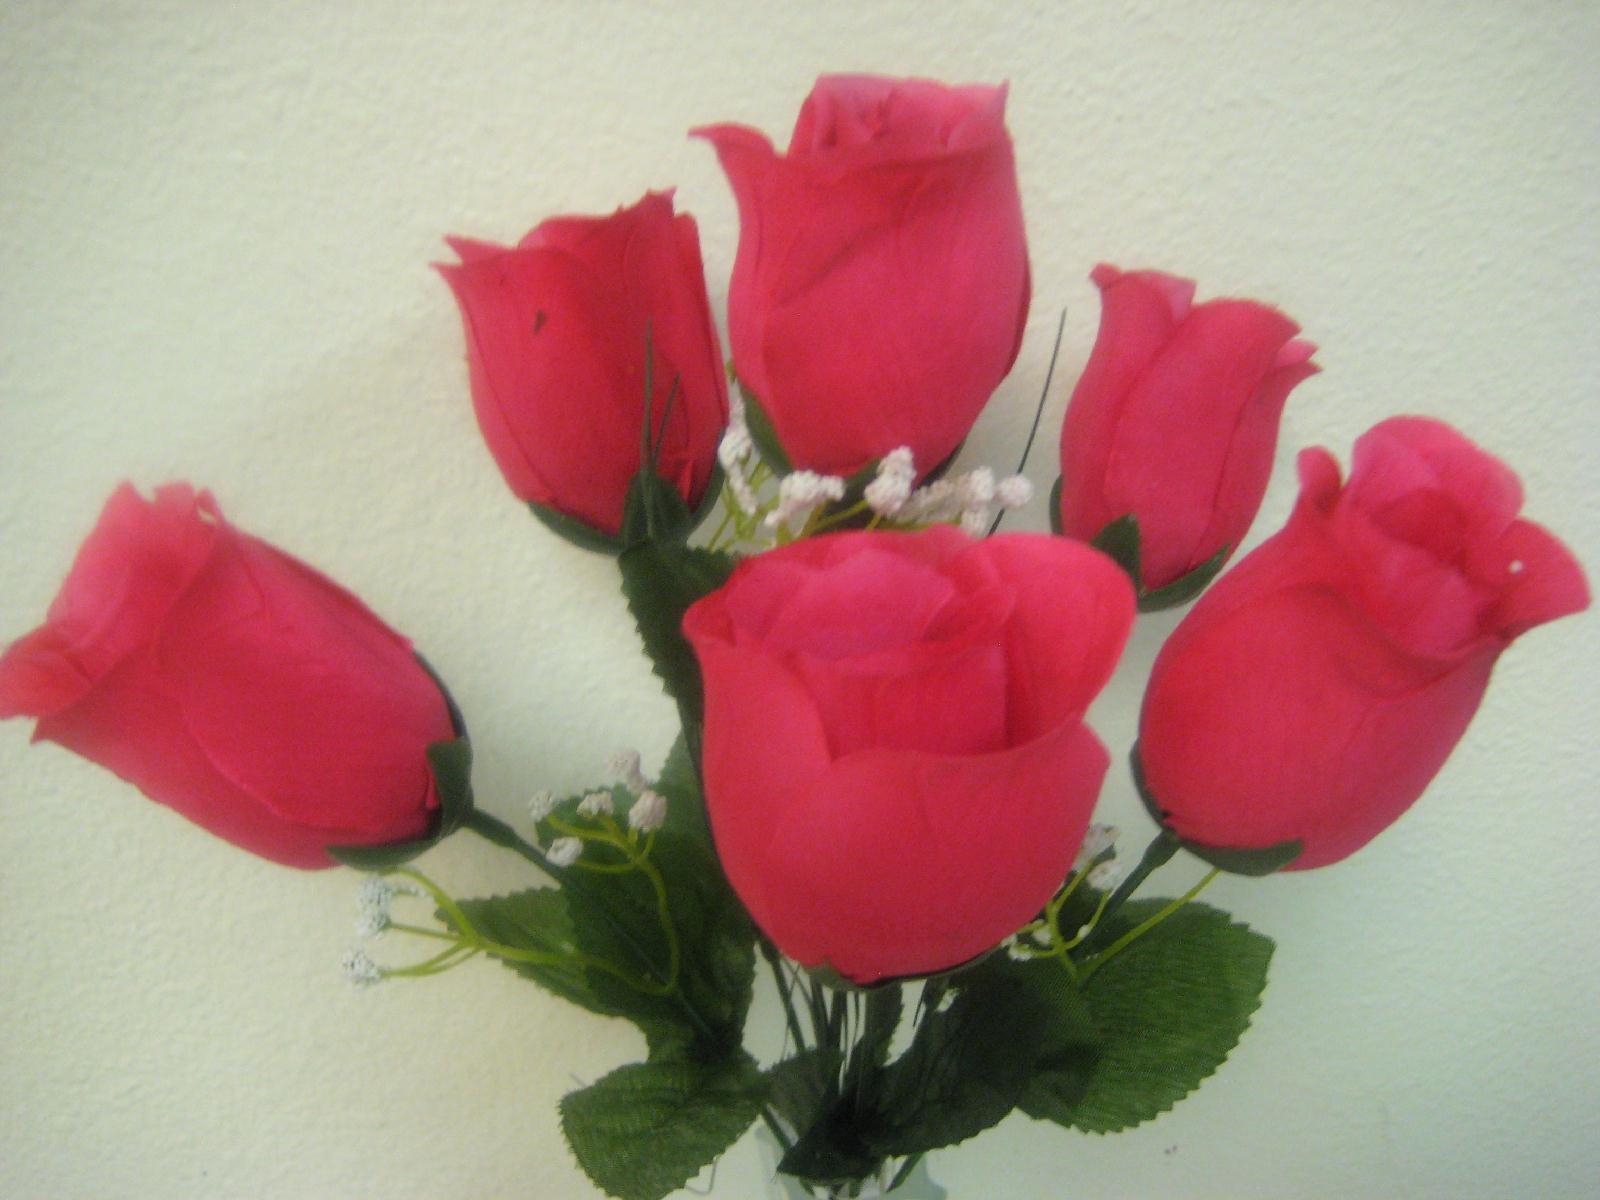 3-Bushes-Rose-Bud-Artificial-Silk-Flowers-13-Bouquet-6-599